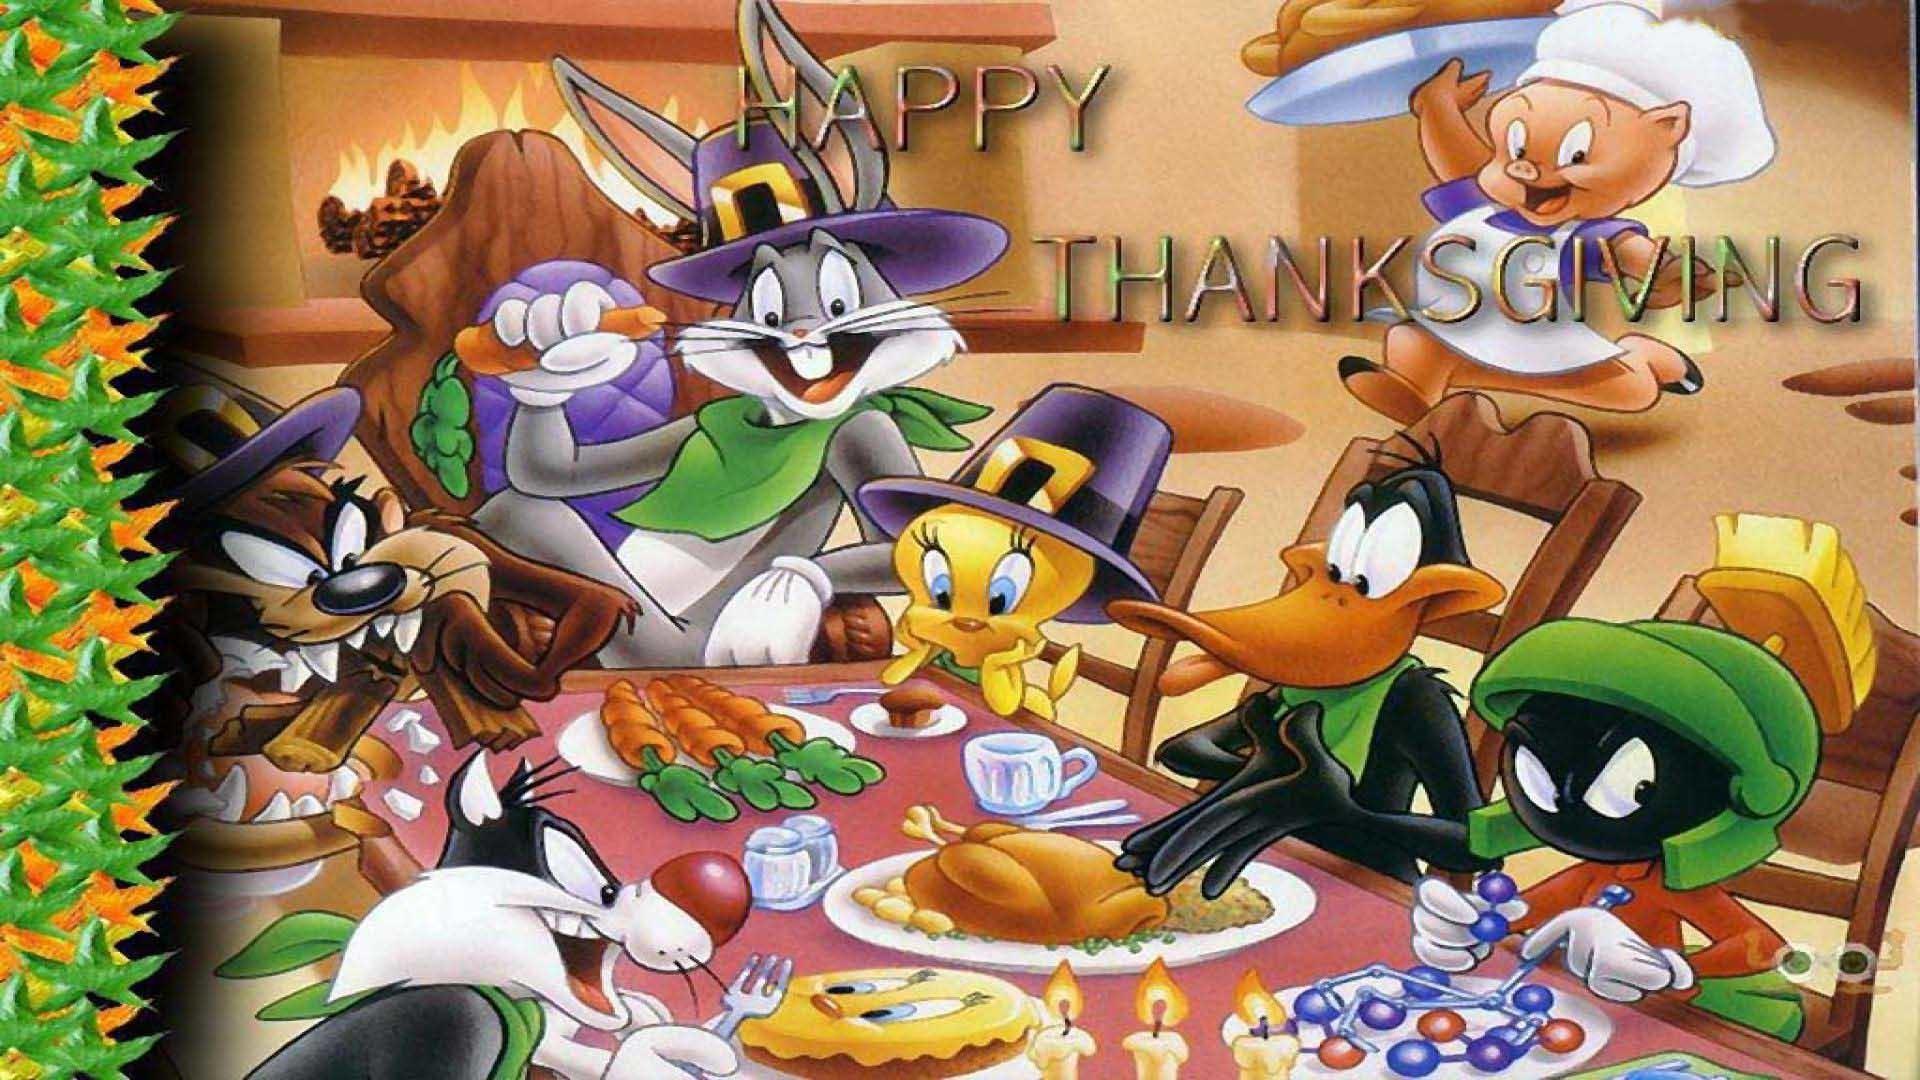 Disney Thanksgiving Desktop